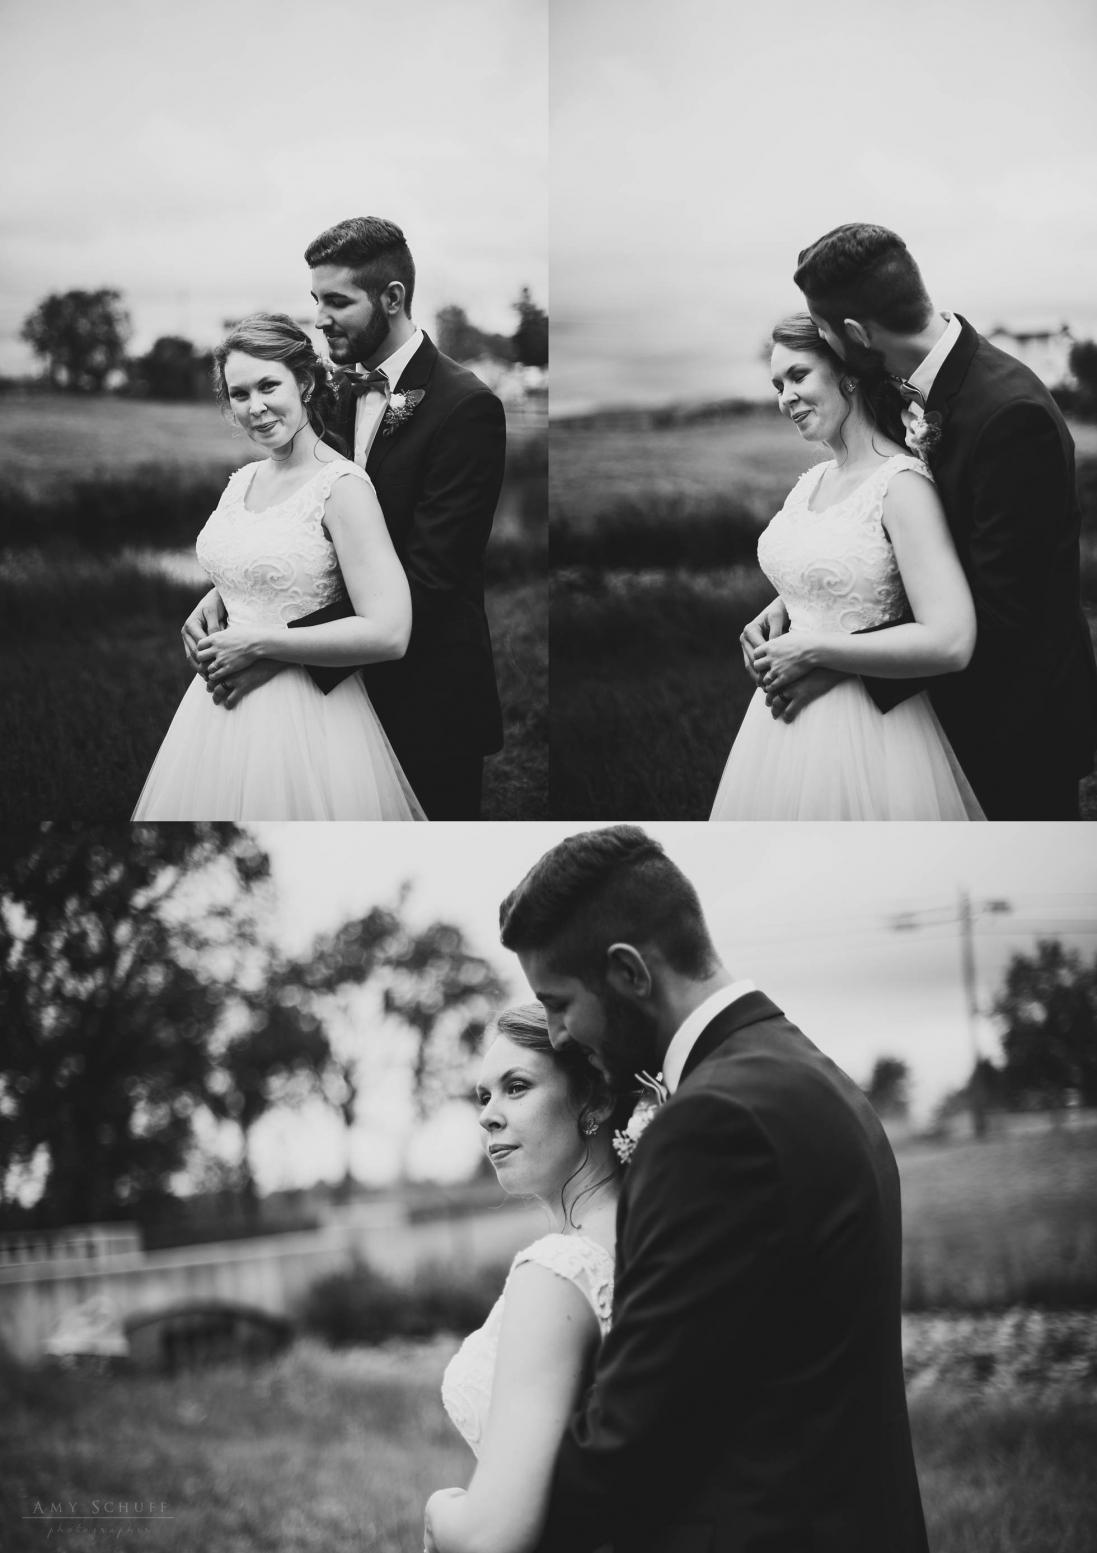 Amy Schuff - Sacramento Wedding Photographer_0097